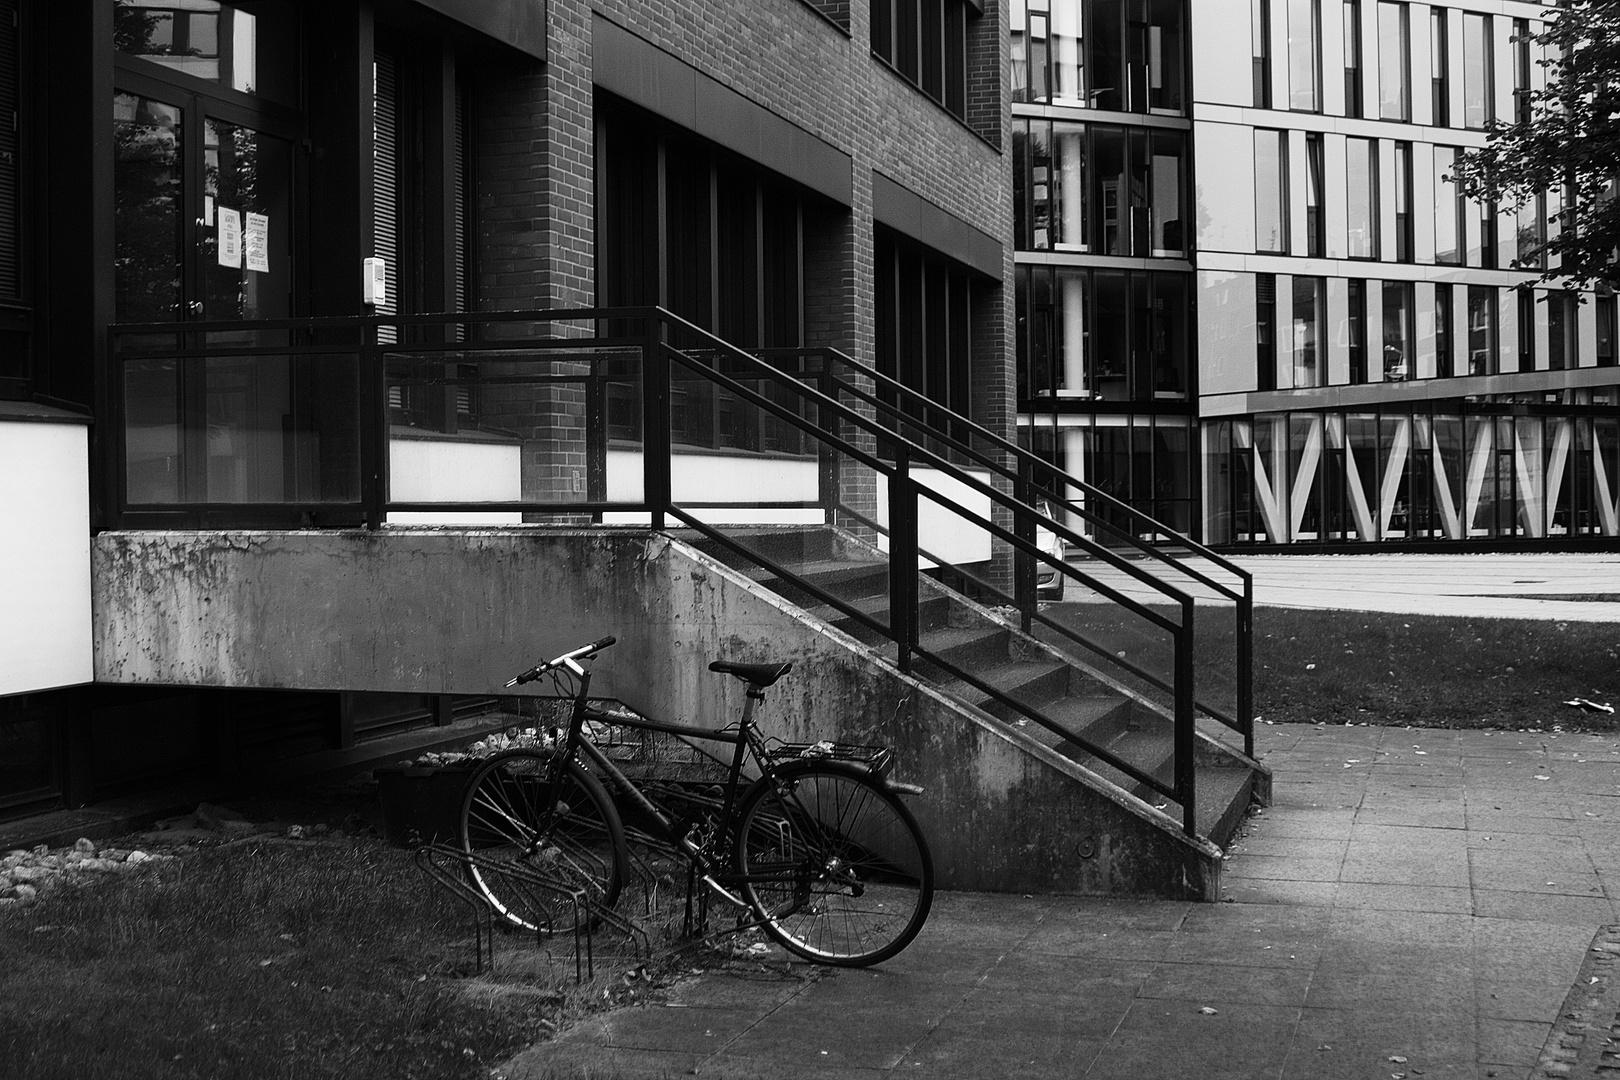 Einsames Fahrrad